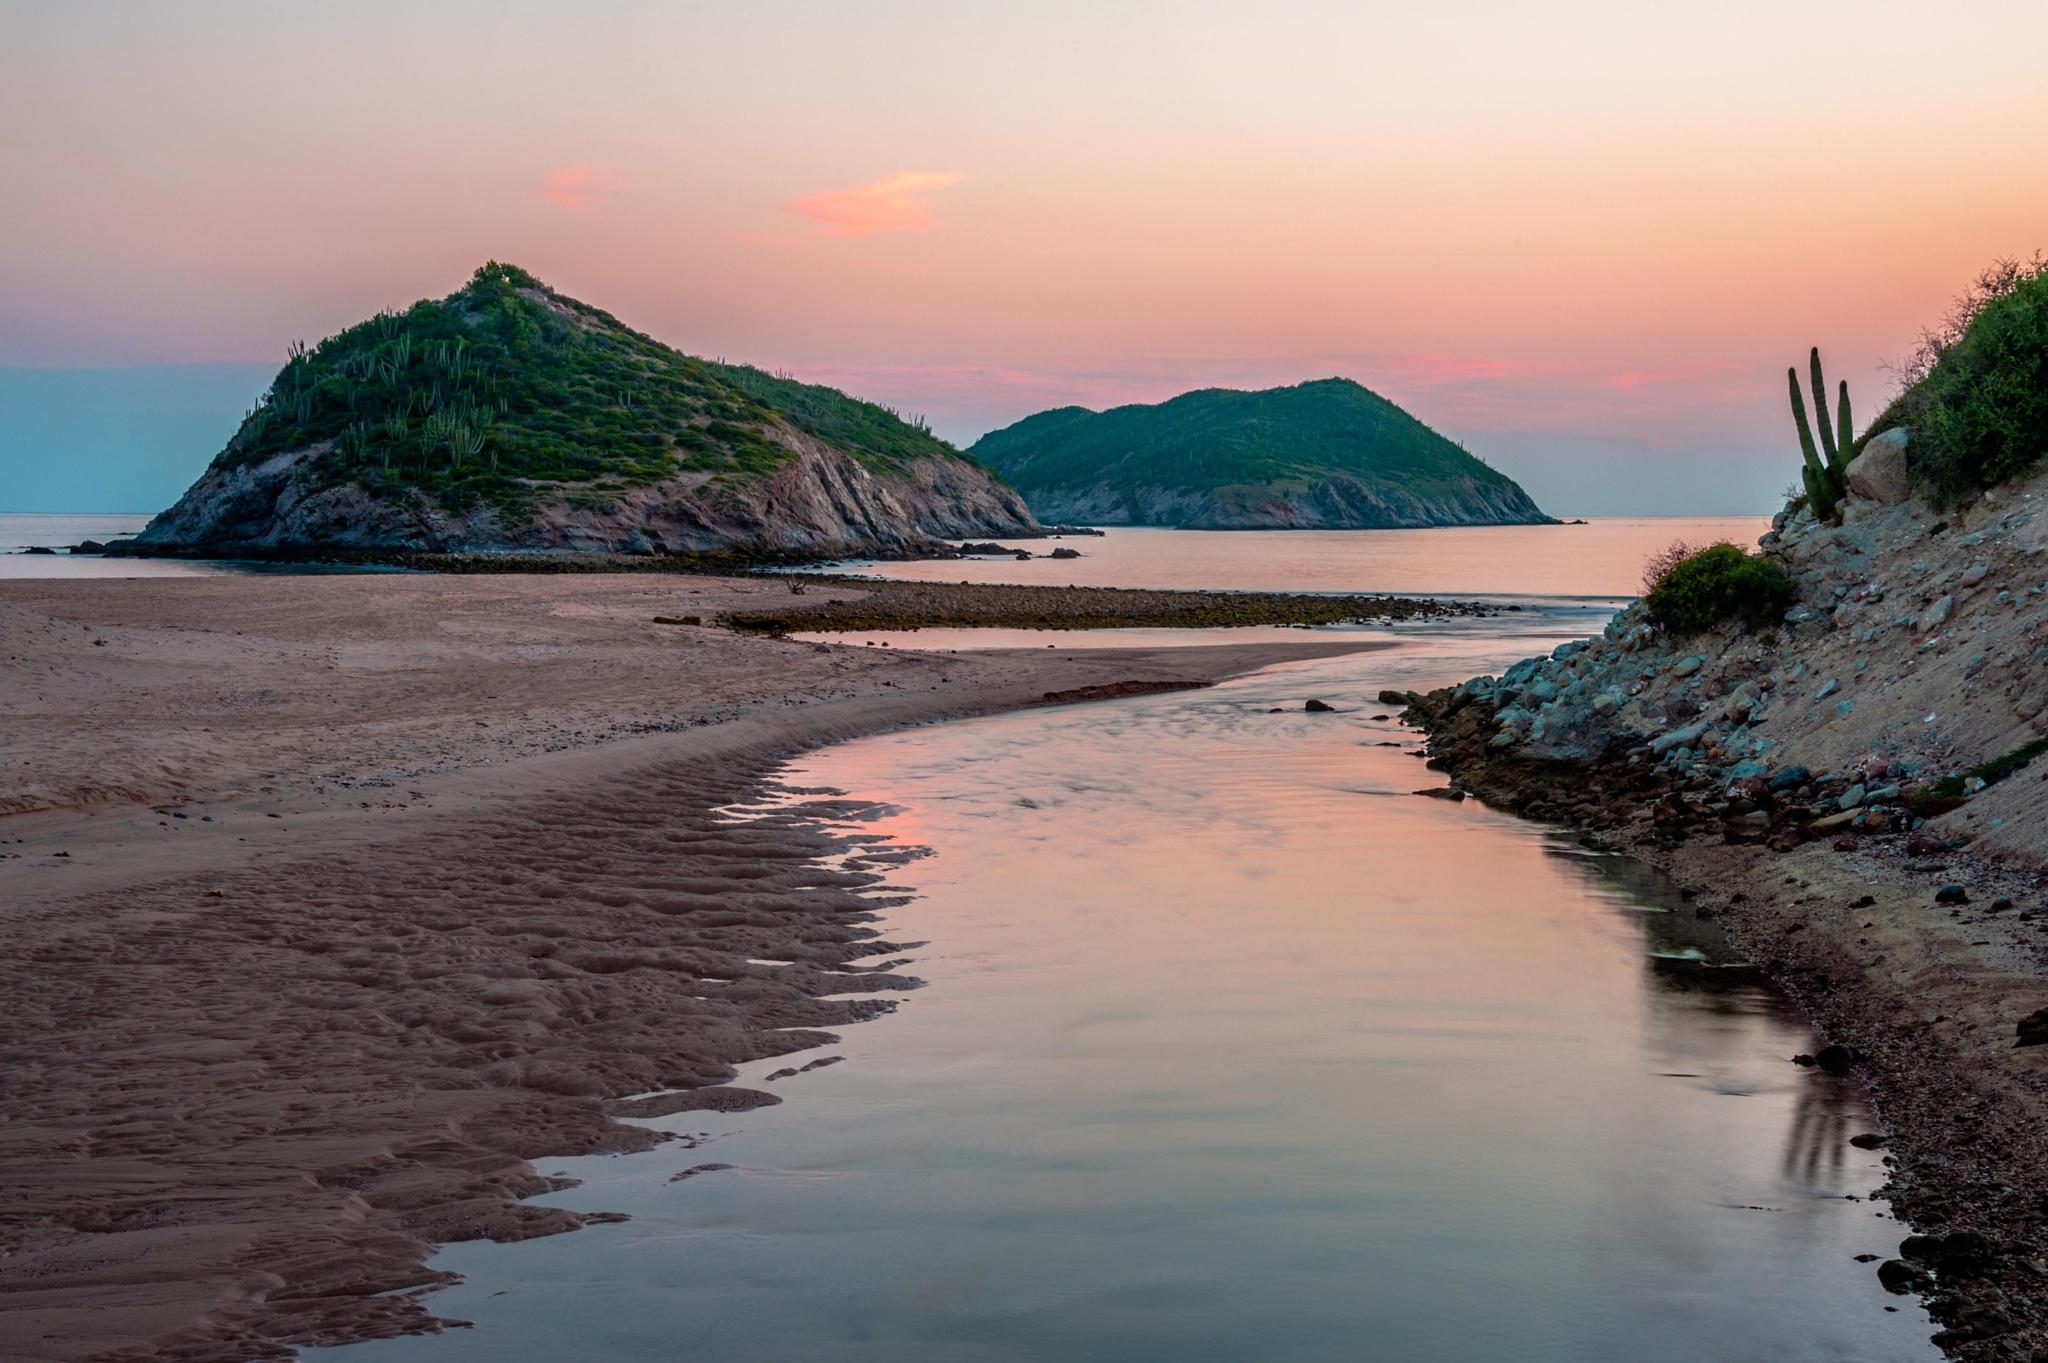 Pink Sunset by grazinawade